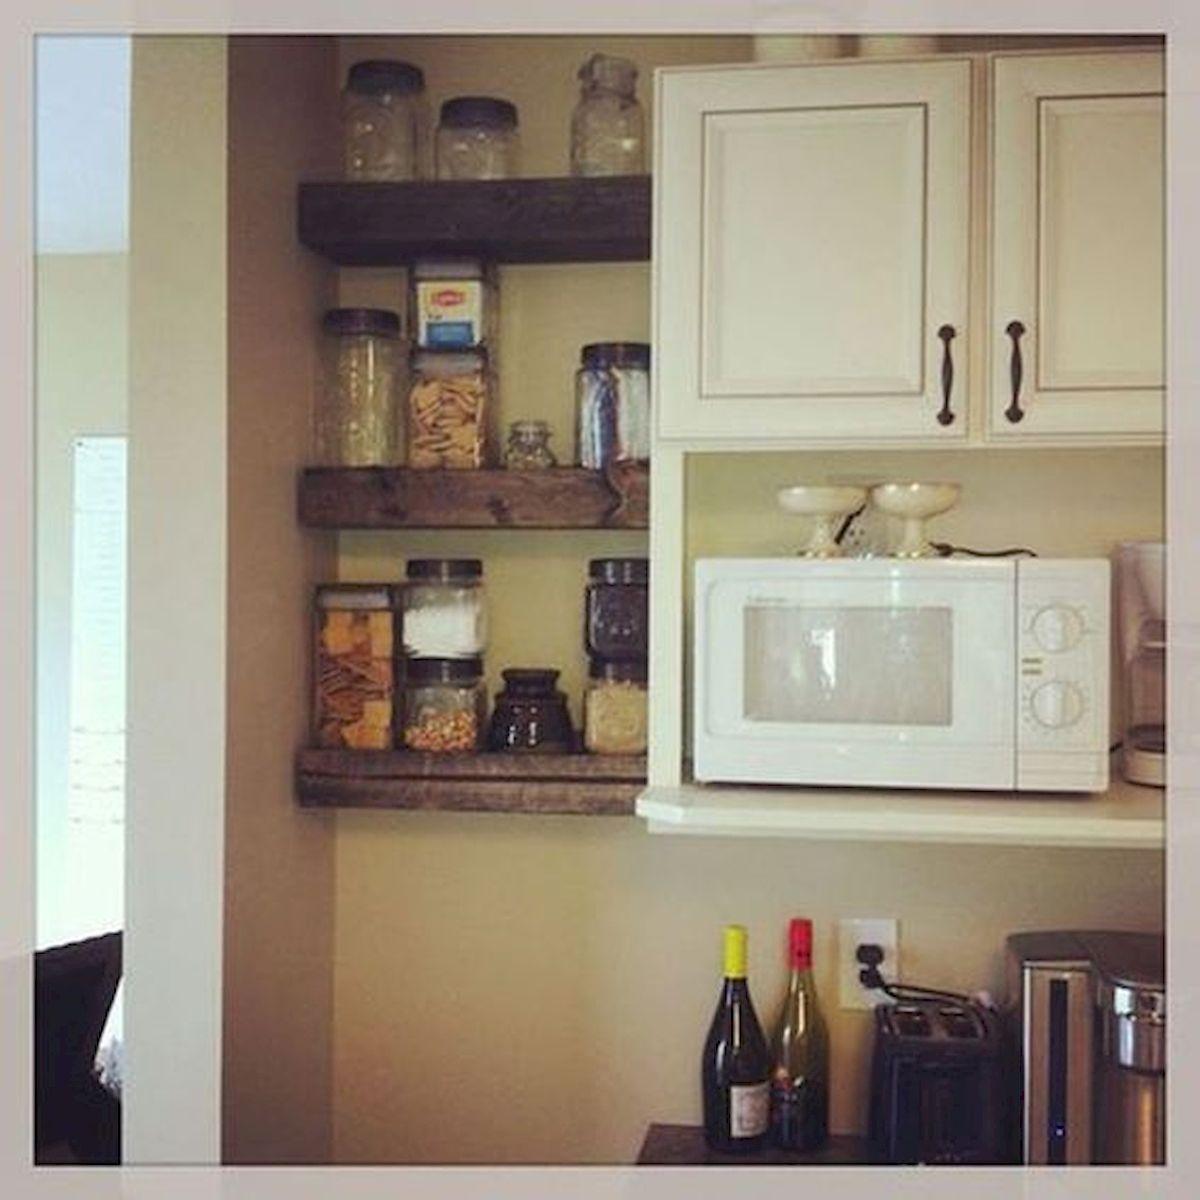 46 Easy DIY Kitchen Storage Ideas for Small Kitchen (29)